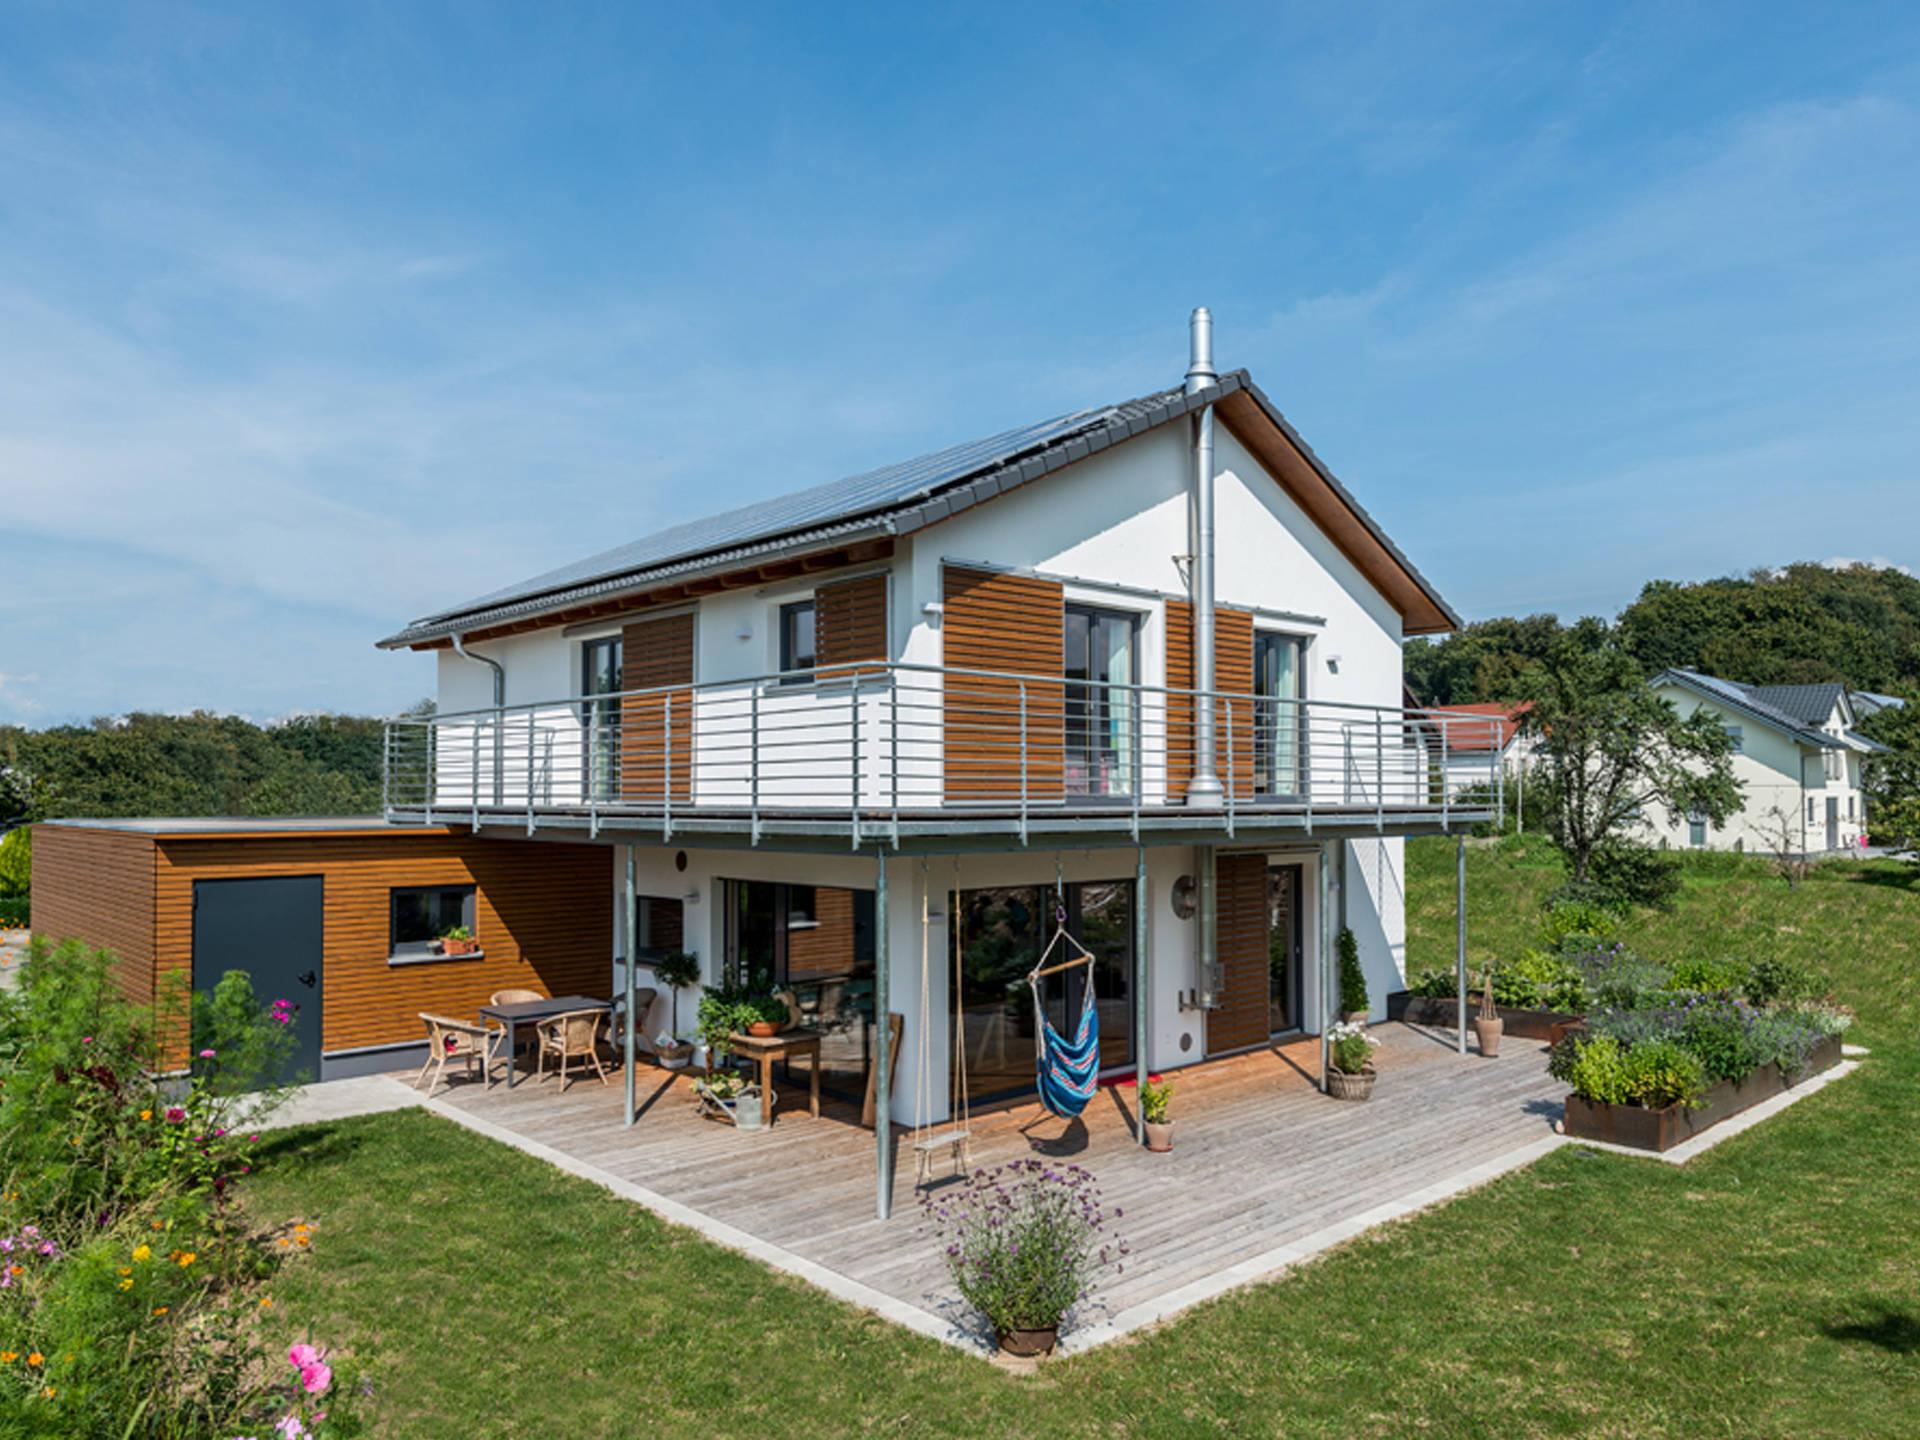 Haus Design 170 - Frammelsberger Holzhaus R. Ingenieur-Holzbau